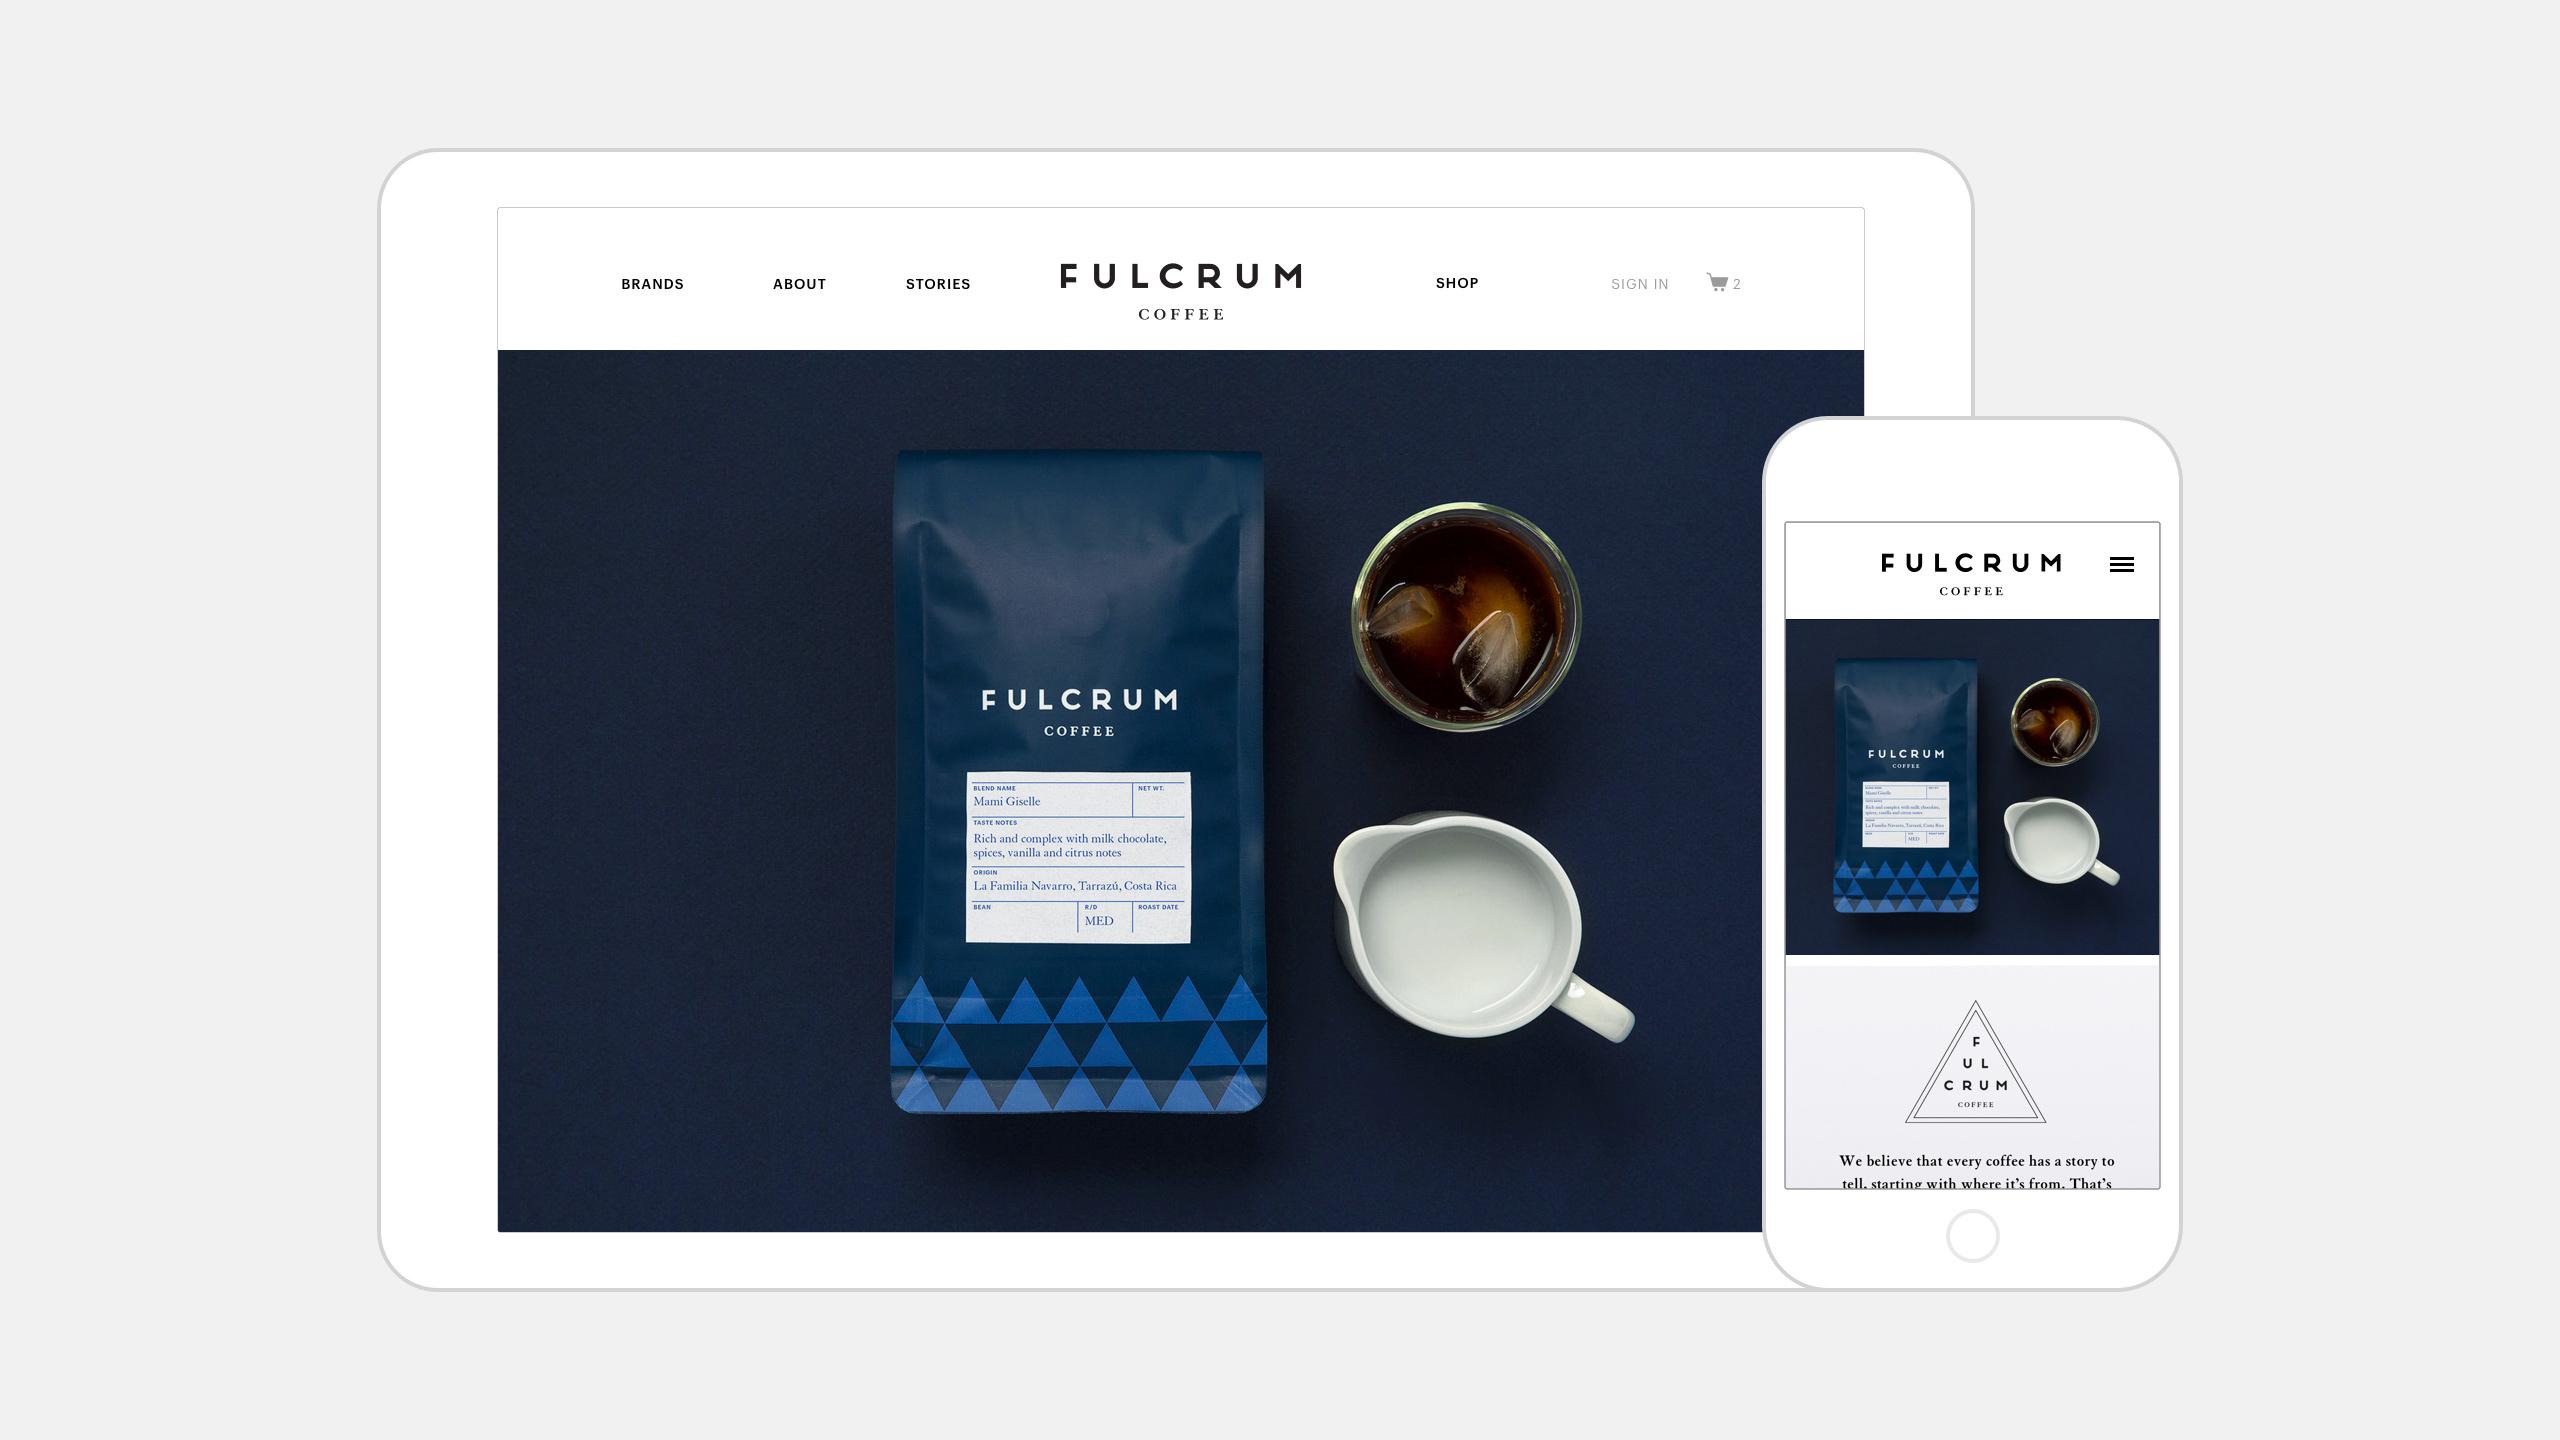 tolleson-case-study-fulcrum-coffee-interactive-04-v2